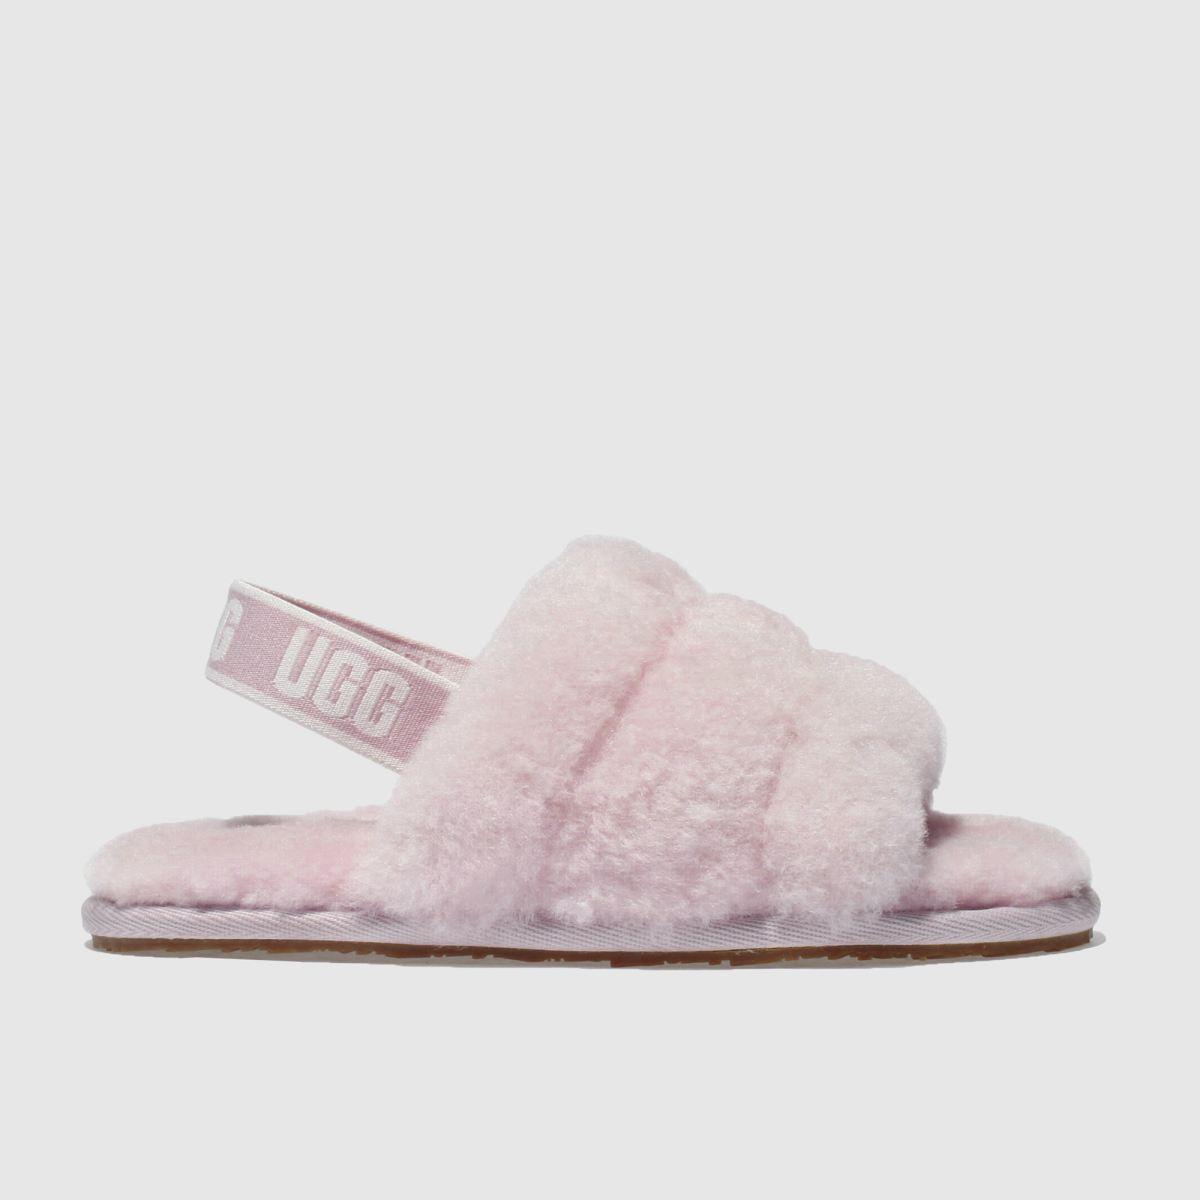 Ugg Pale Pink Fluff Yeah Slide Boots Toddler